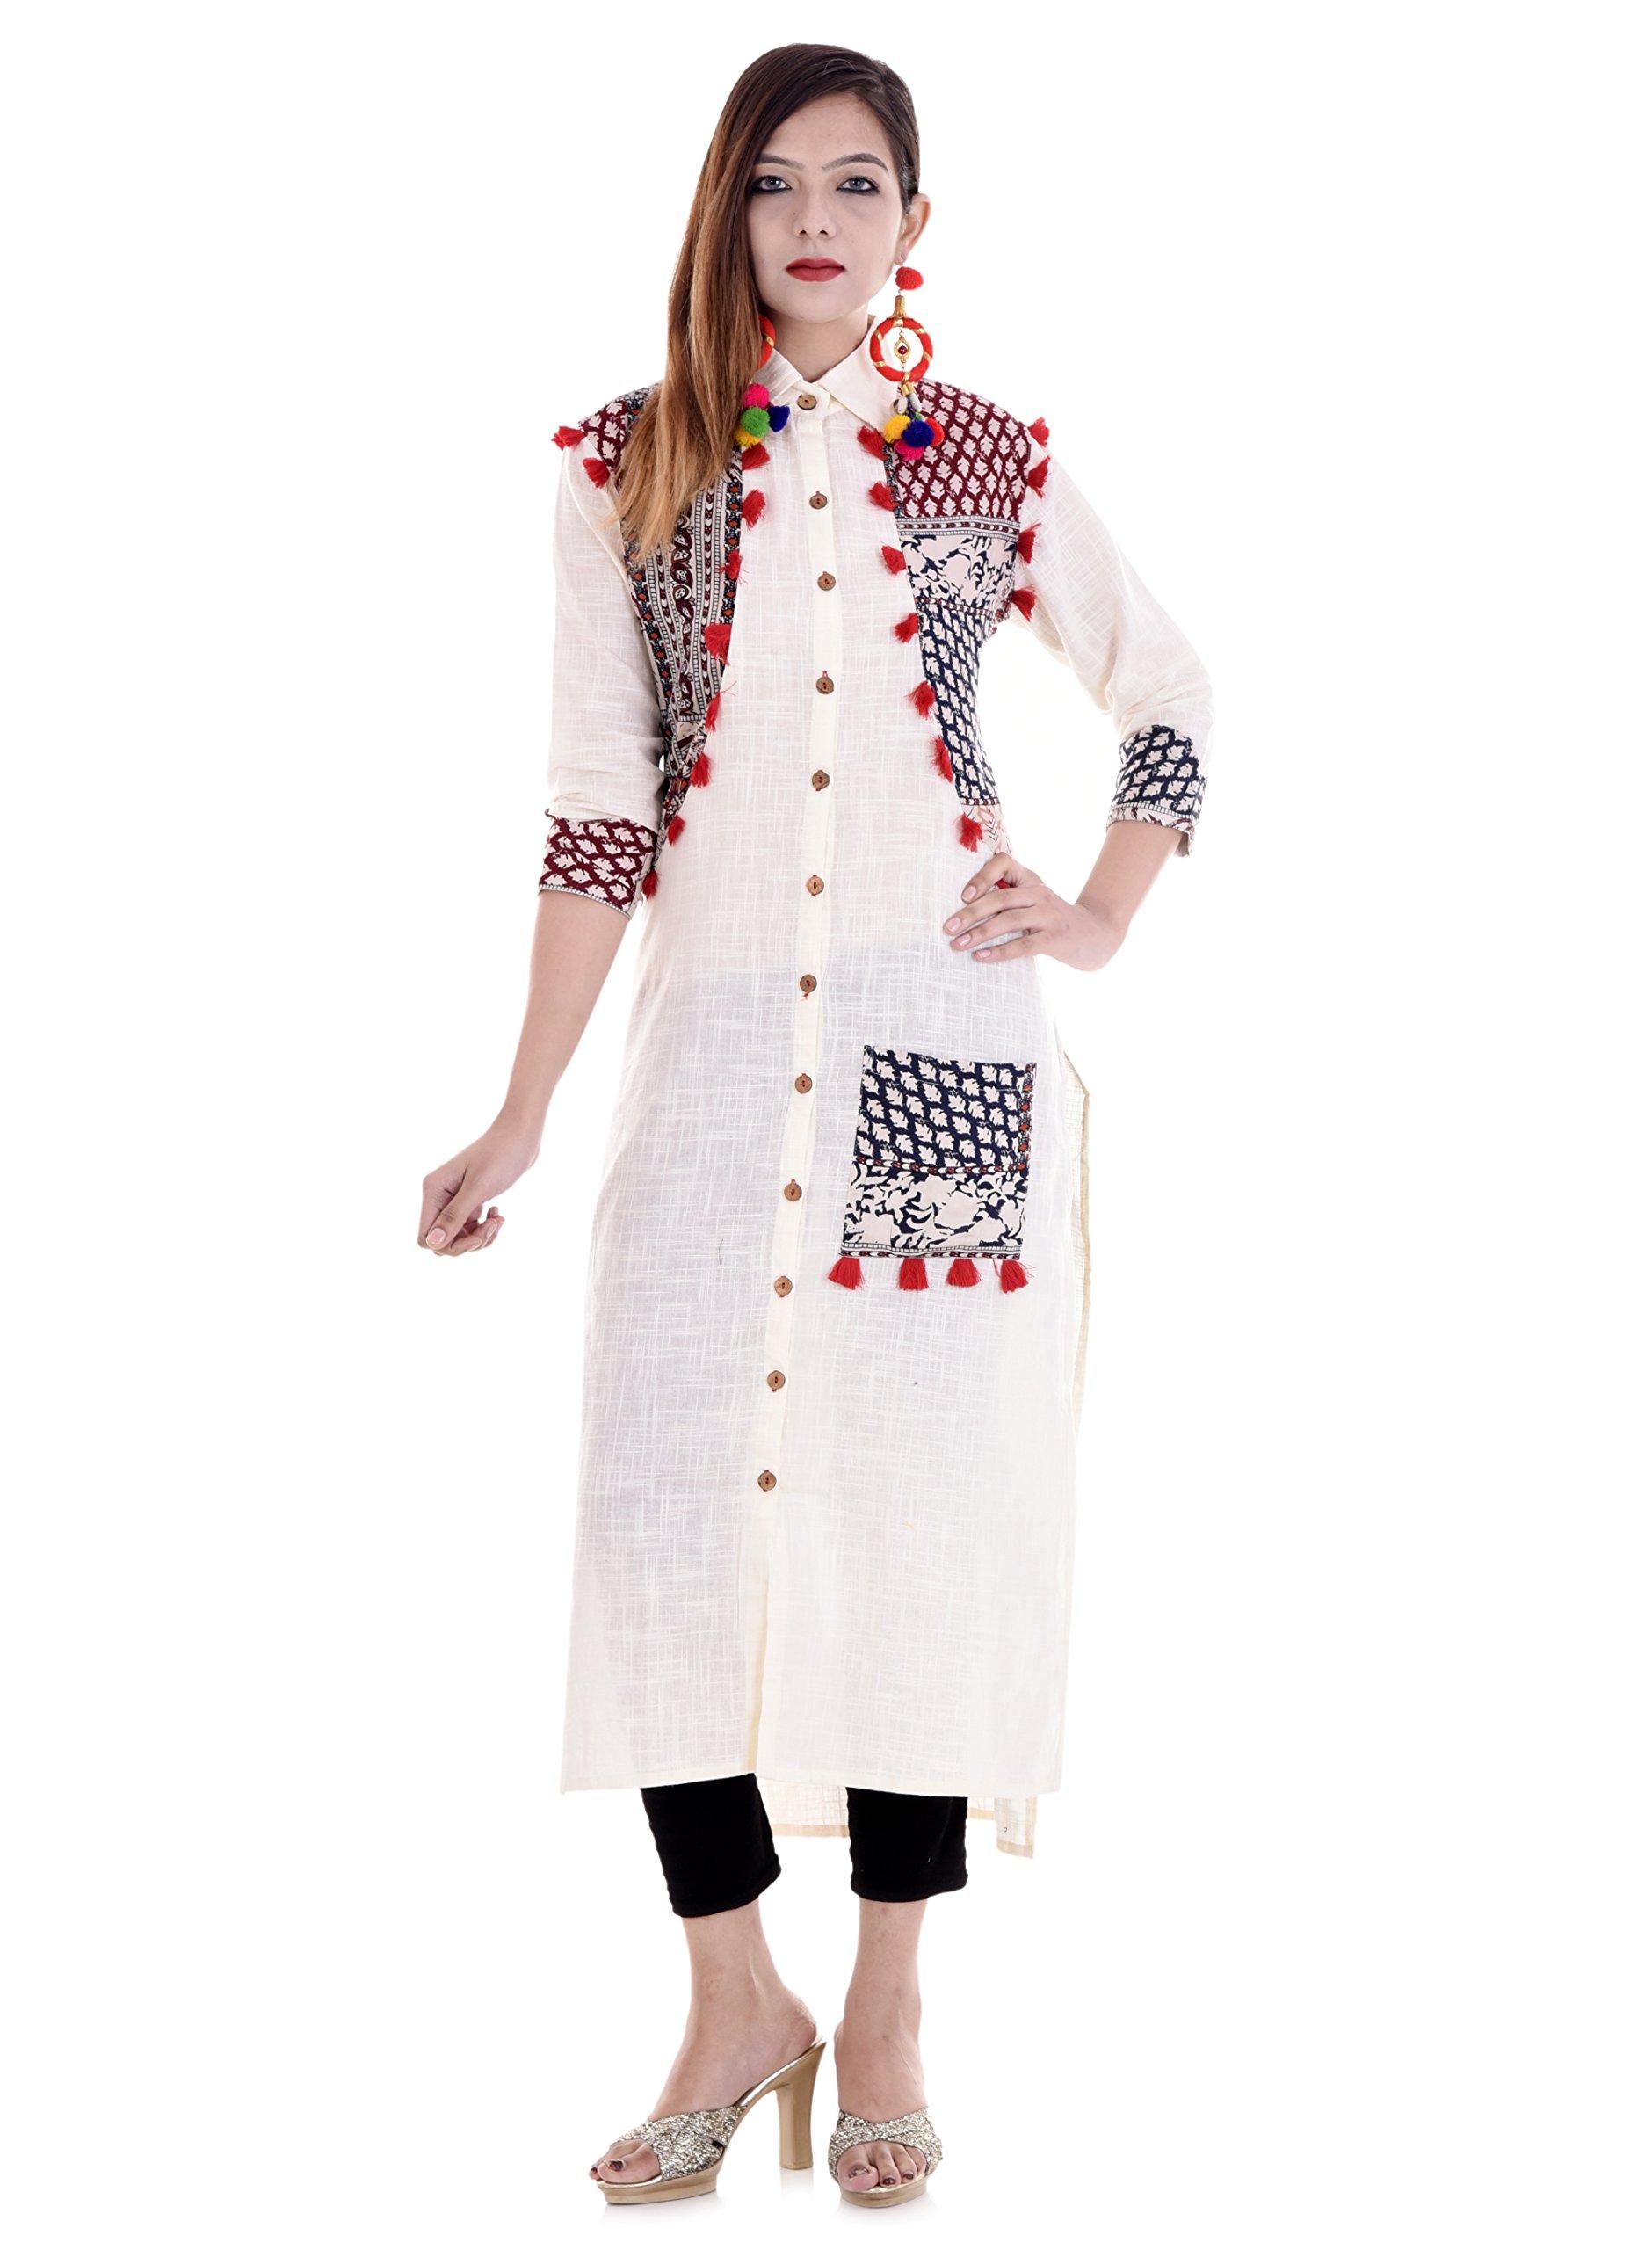 Vihaan Impex Kurtis for Women Kurtas for Women Indian White Color Kurti for Women by Vihaan Impex